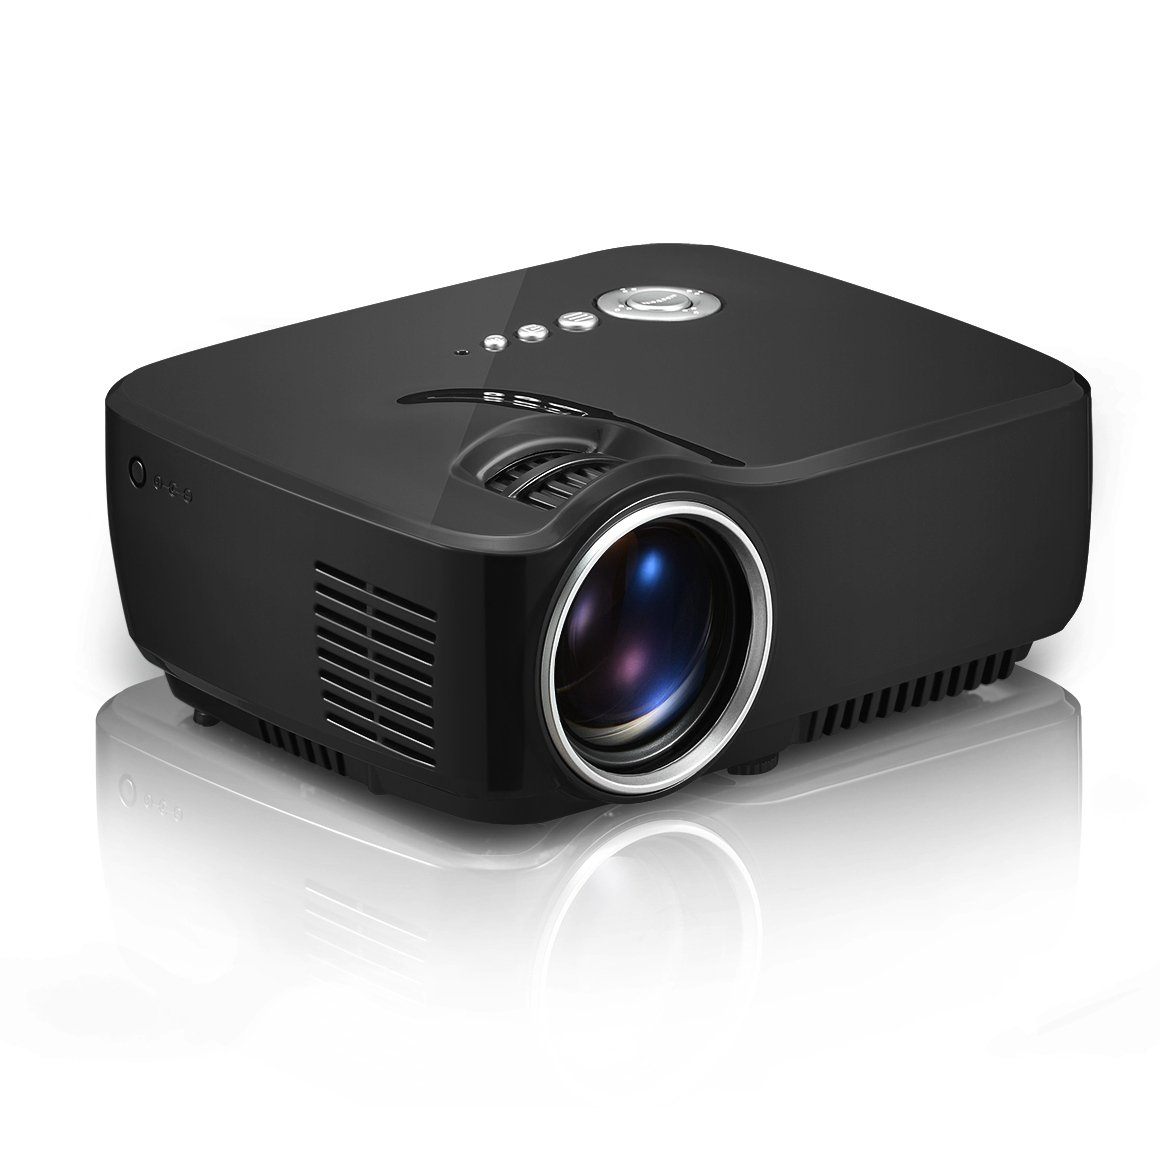 Simplebeamer GP70 LED Projector 1200 lumens 800*480 Multimedia Beamer Mini Portable 1080p Video Game Projectors support USB/TF/VGA/HDMI/AV Port for Home Theater( Black)